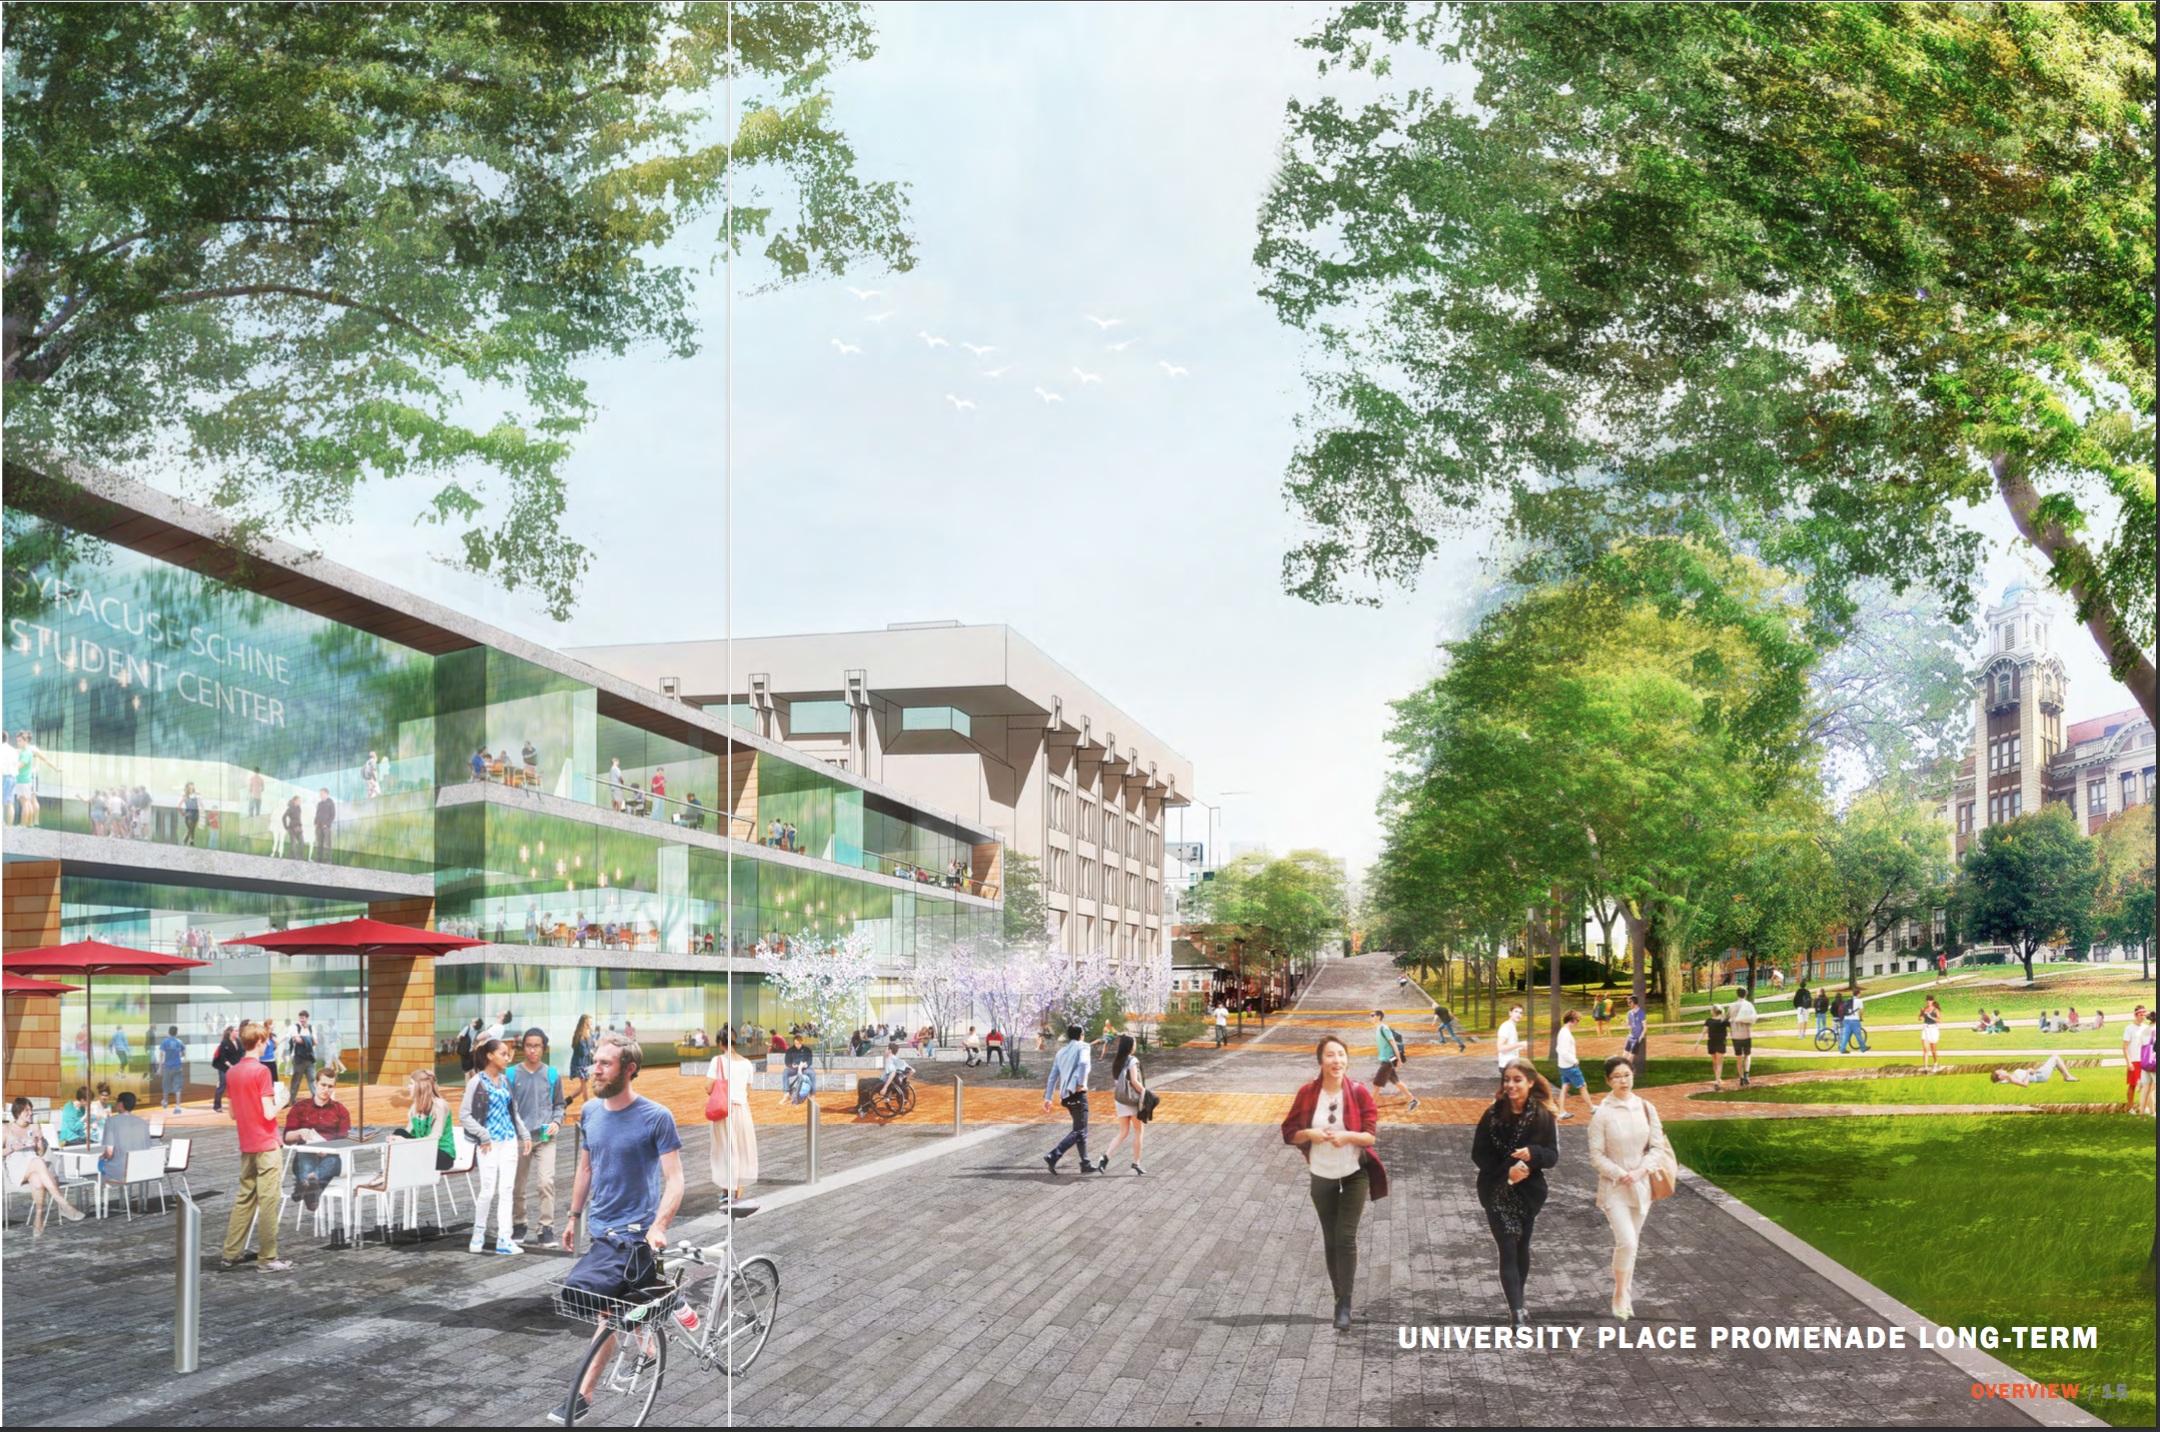 university place promenade rendering 14-15